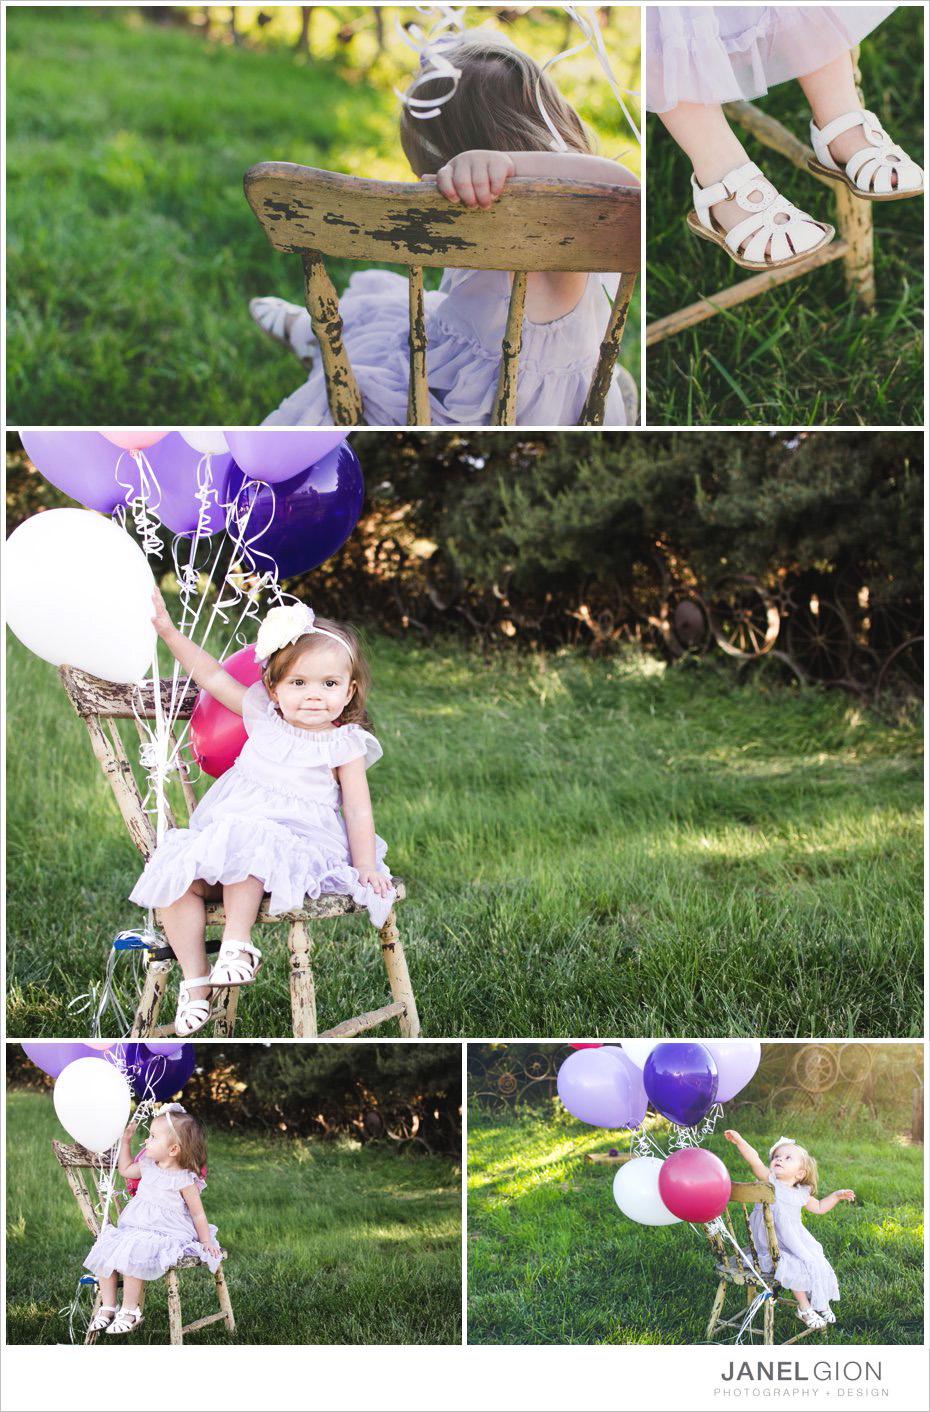 Janel-Gion-toddler-girl-balloon-photos_00091.jpg